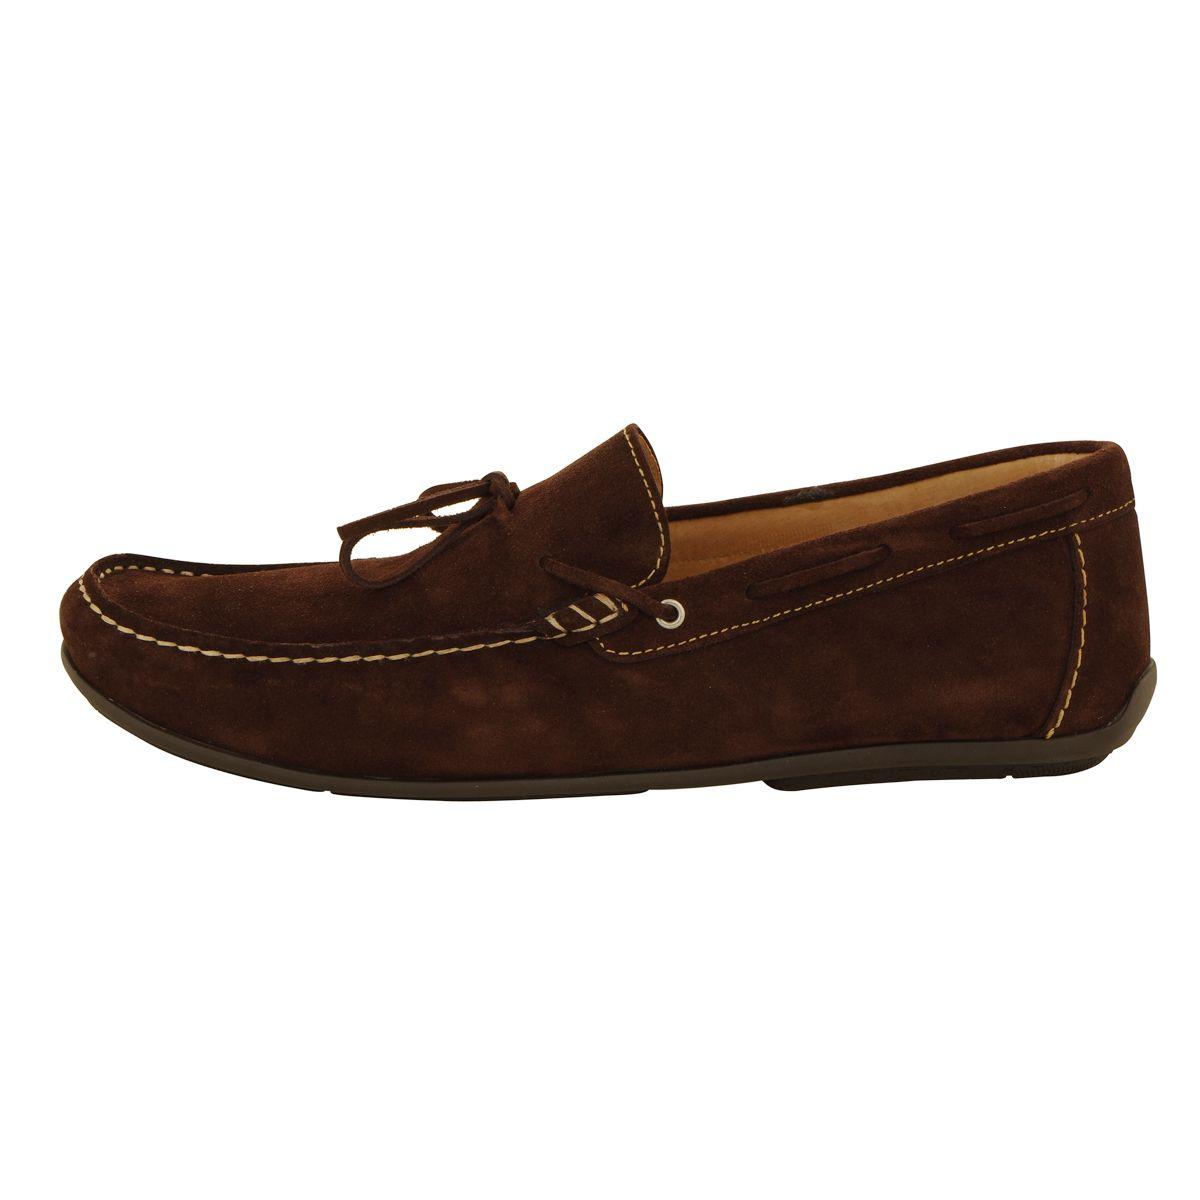 chaussures mocassins marron fonc grande taille jusqu 39 au. Black Bedroom Furniture Sets. Home Design Ideas